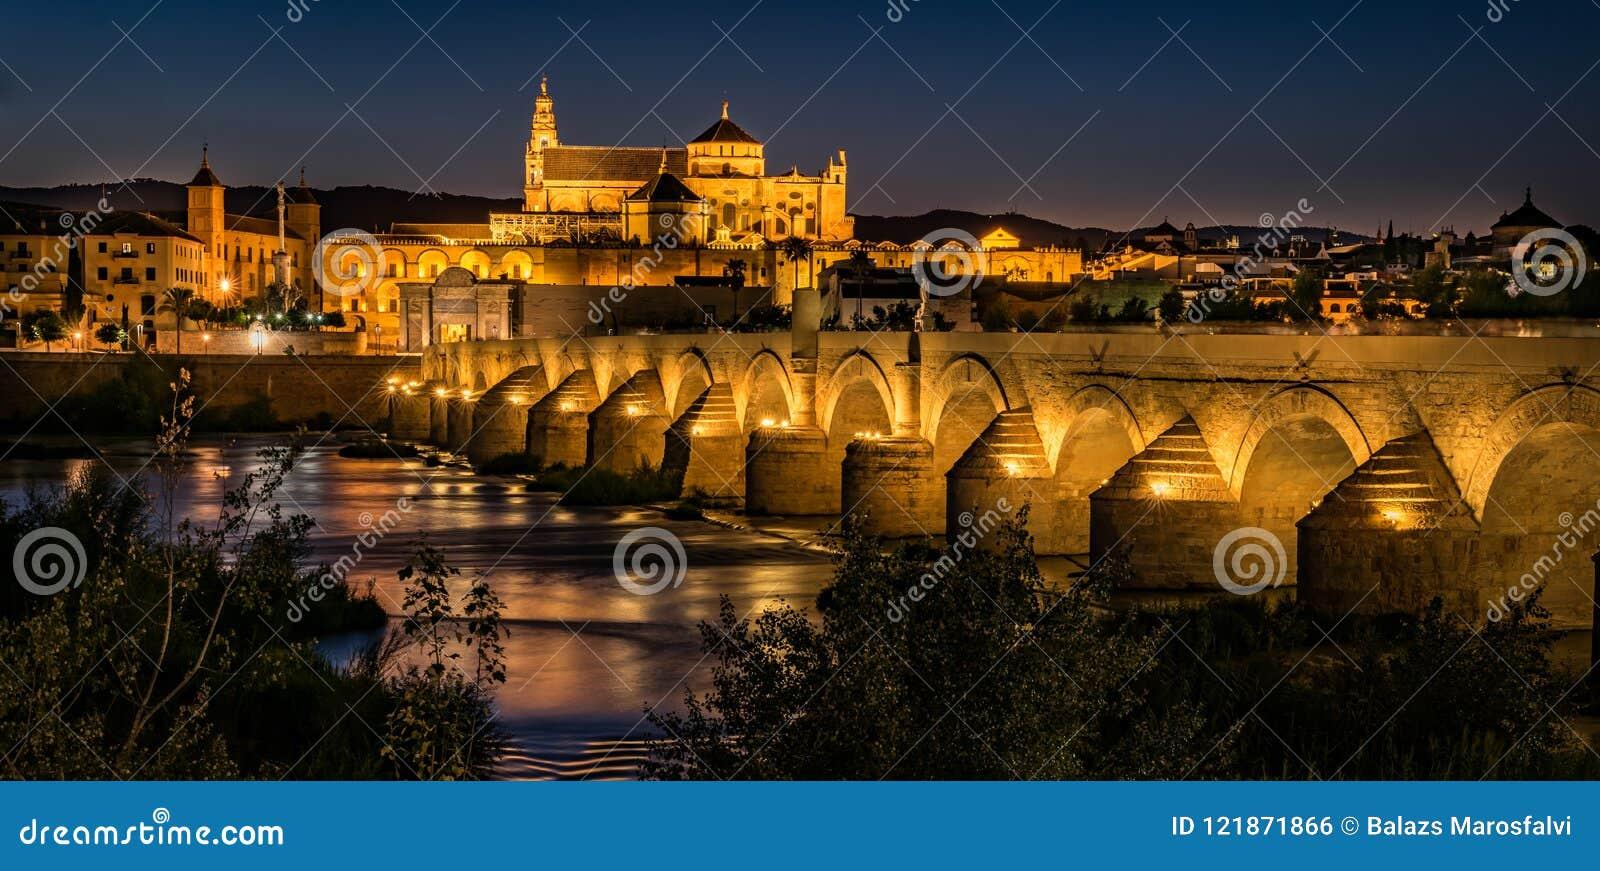 A catedral da mesquita em Córdova na noite